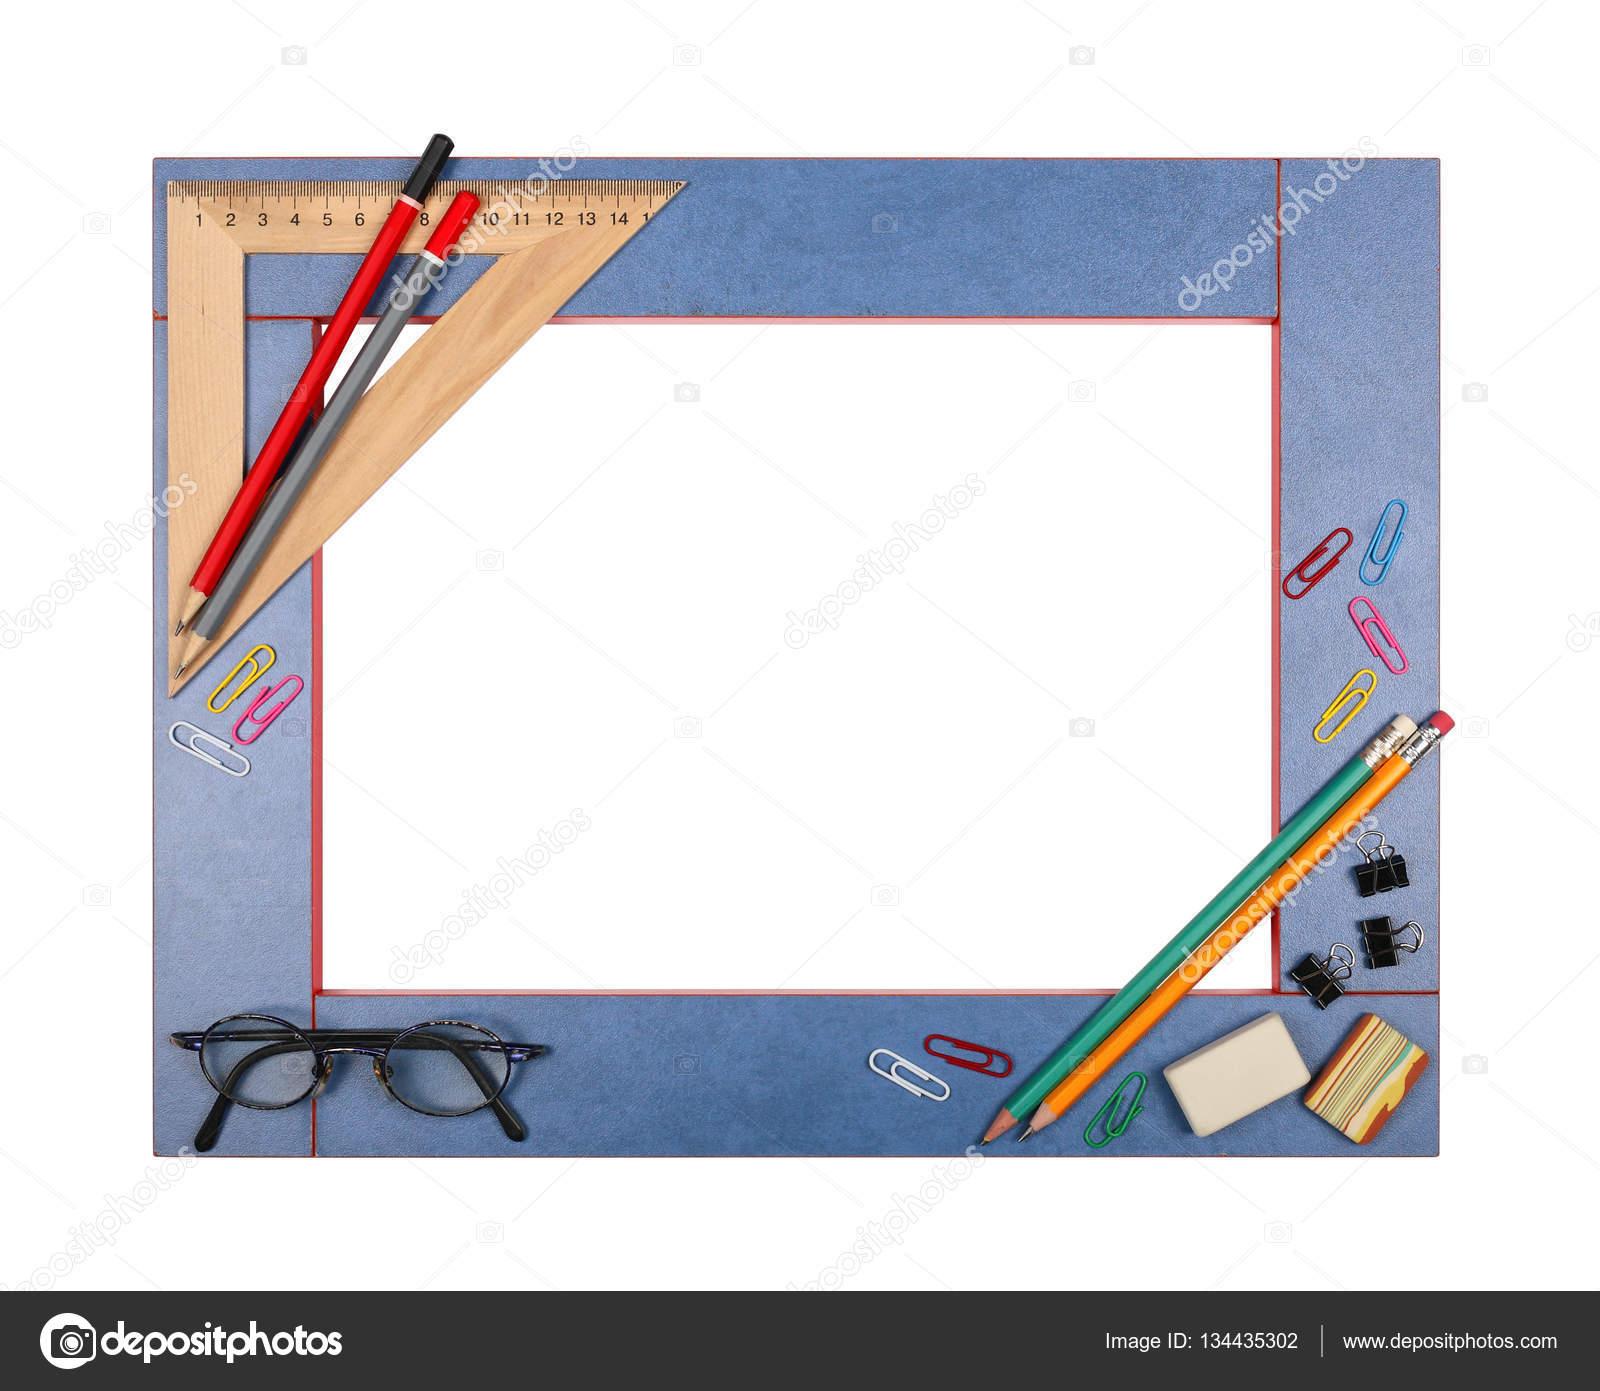 Ziemlich Schule Fotorahmen Galerie - Benutzerdefinierte Bilderrahmen ...